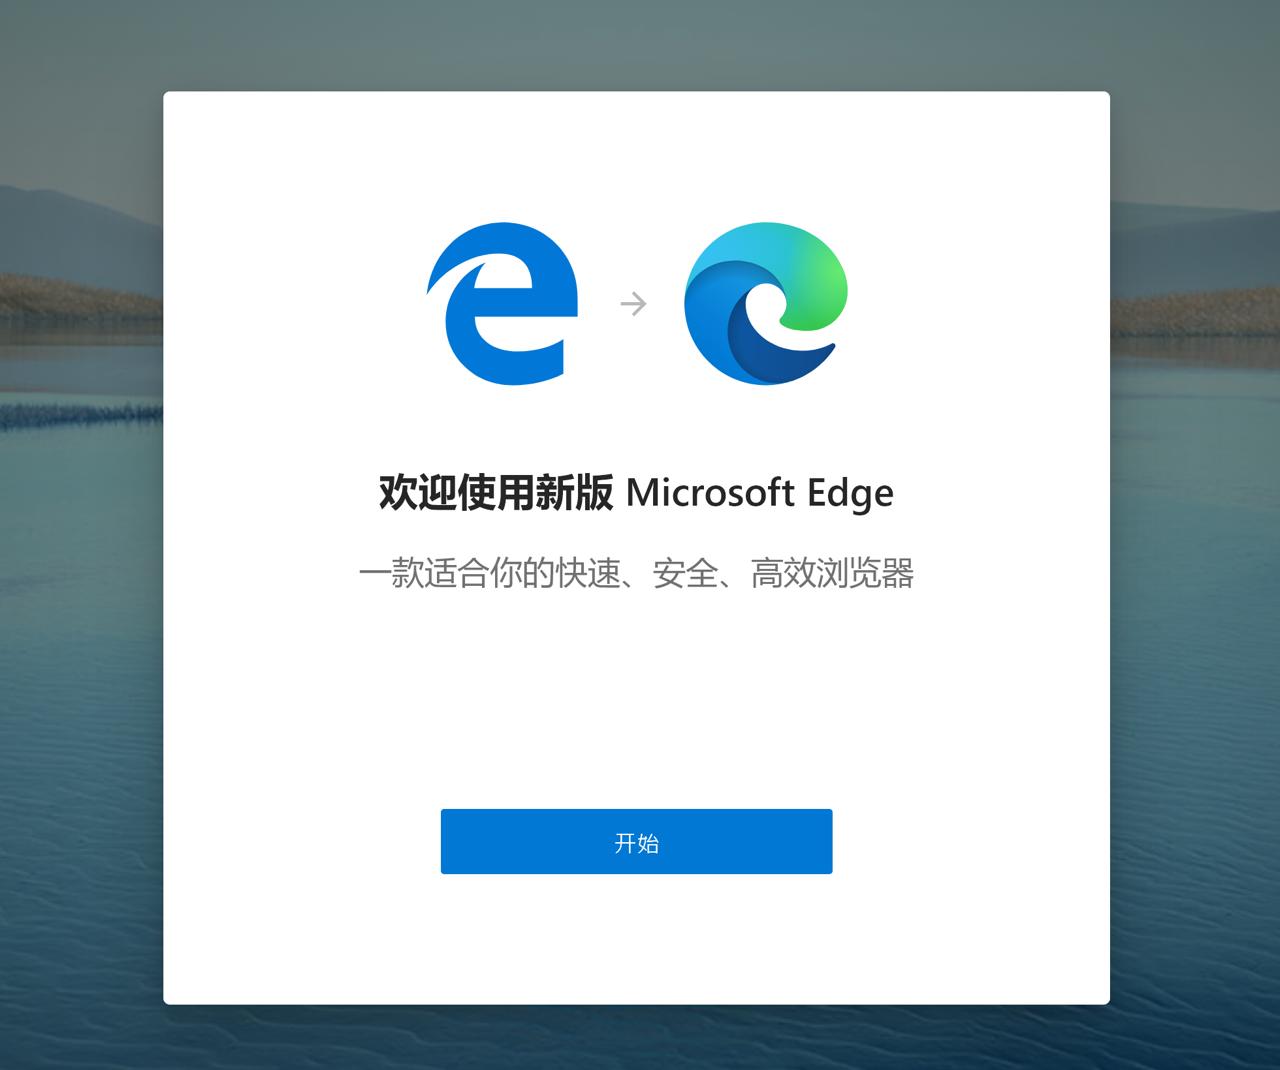 Microsoft Edge 瀏覽器正式版